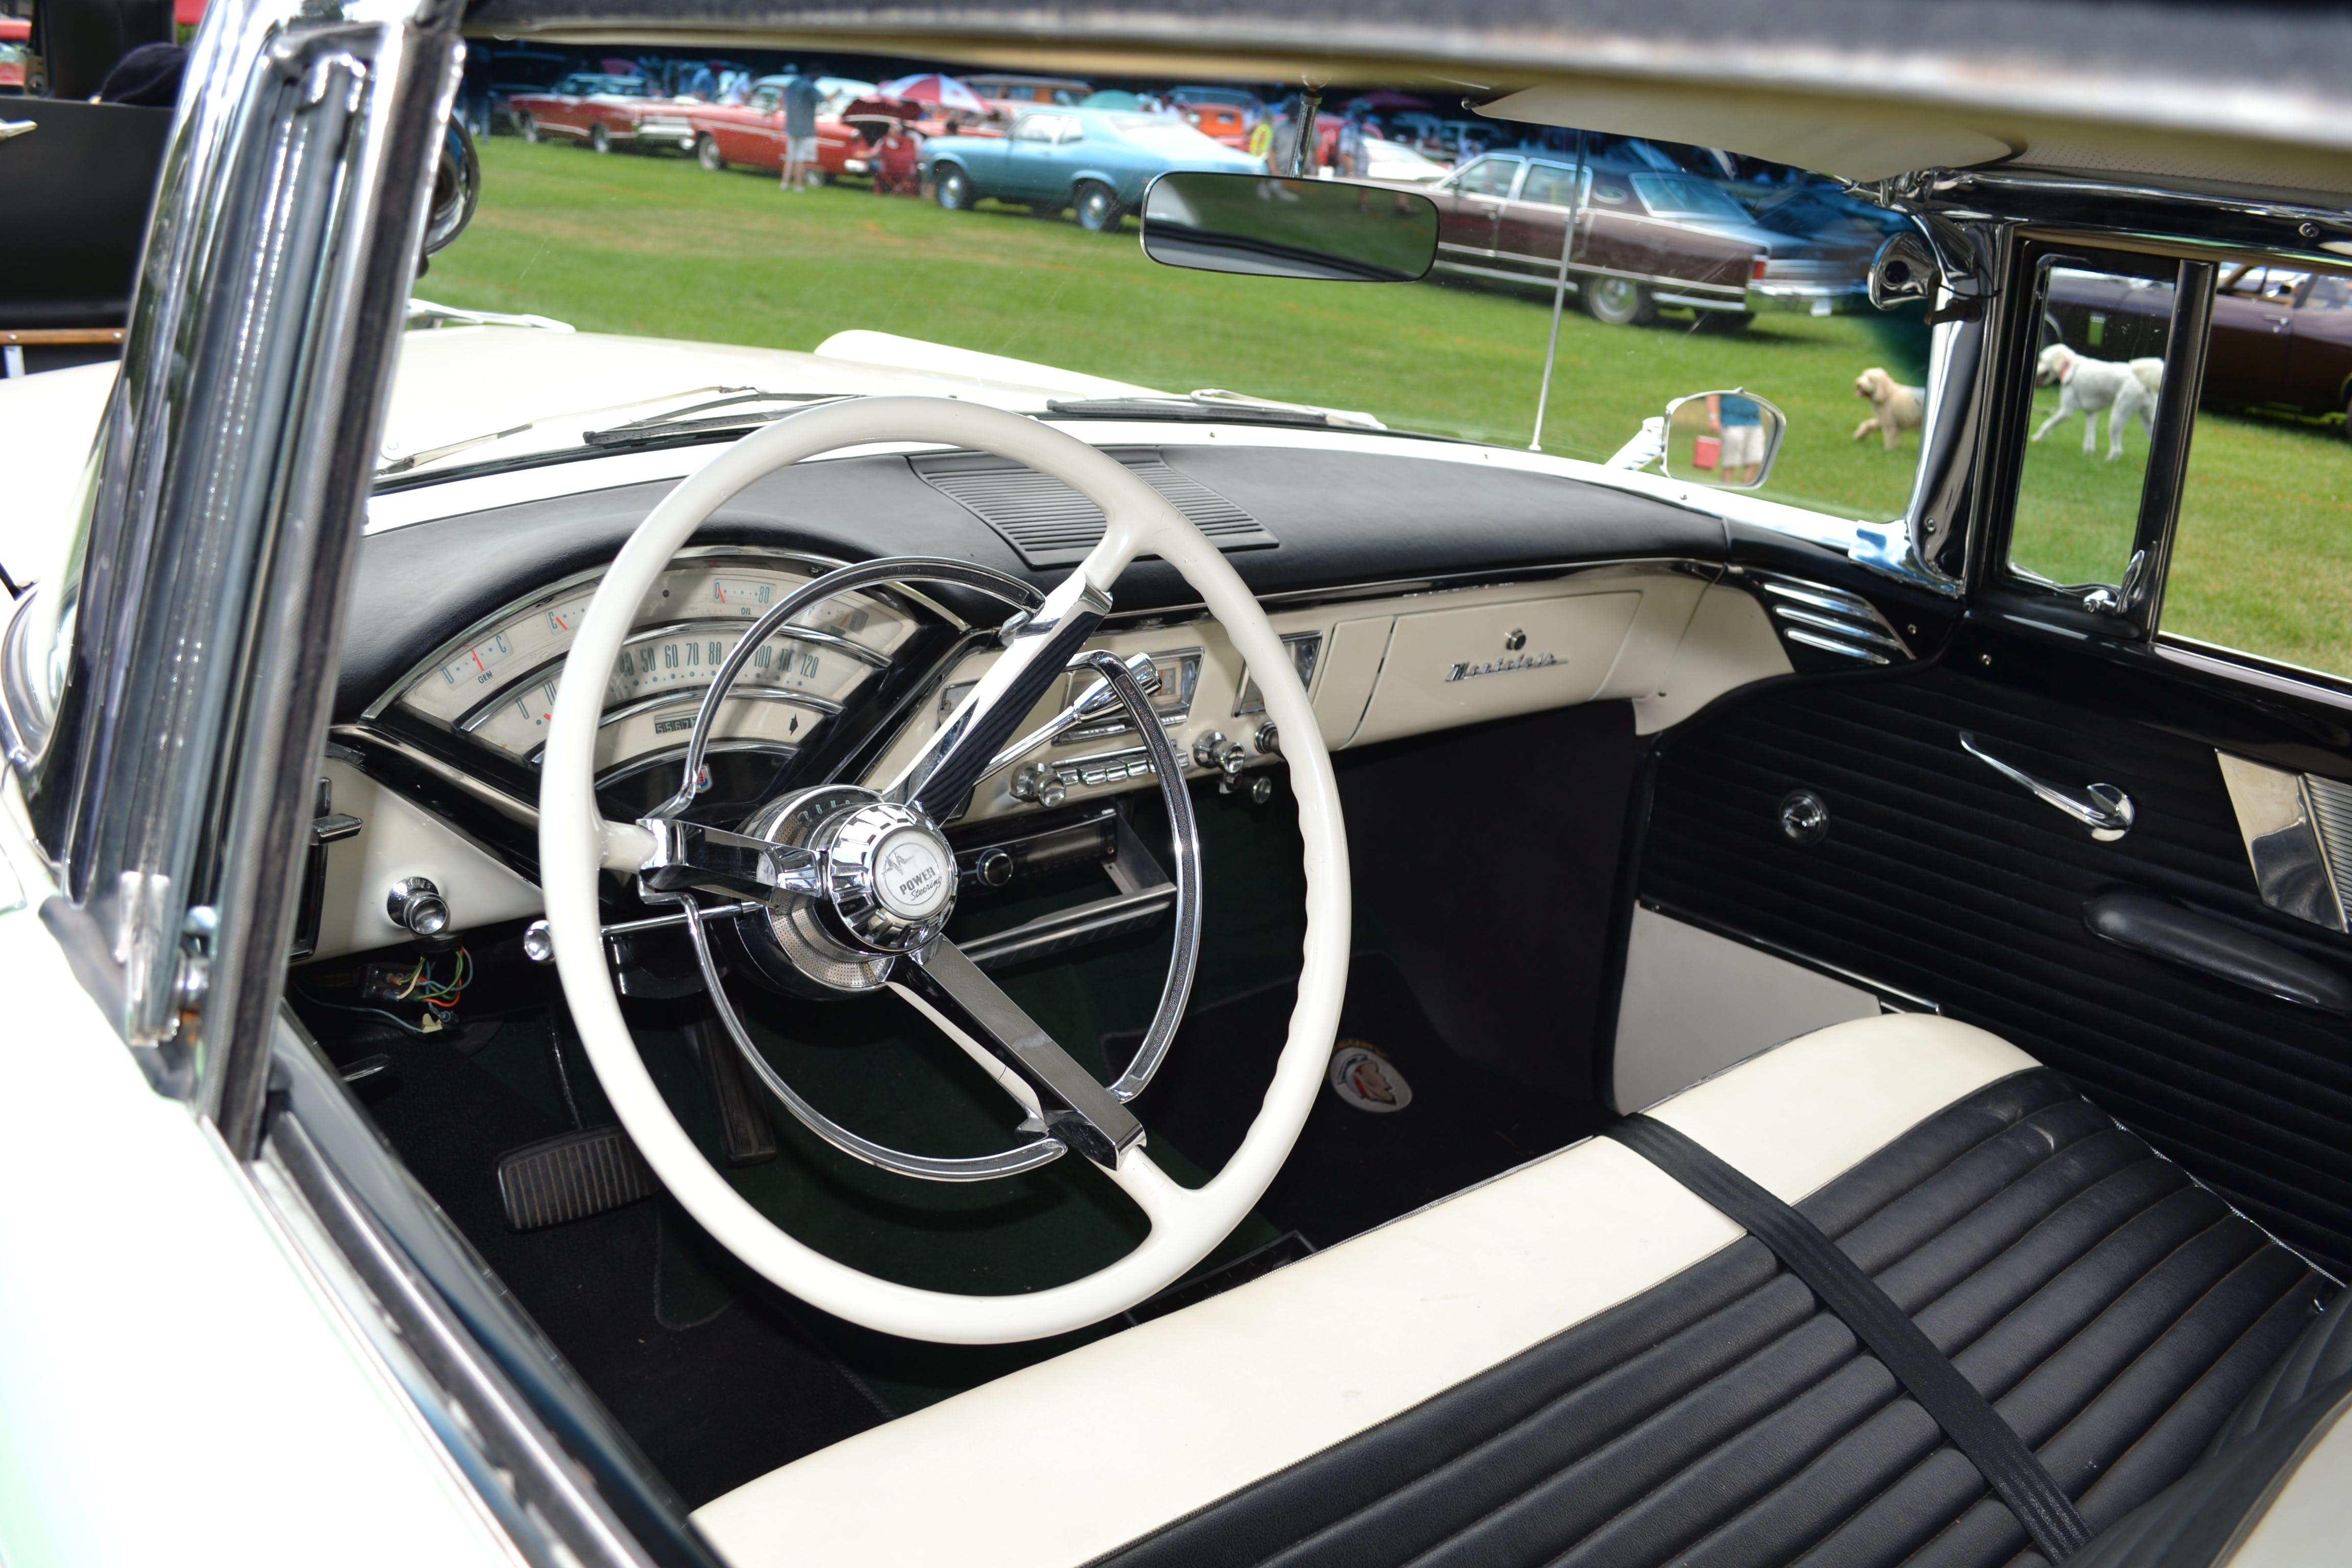 Free stock photo of car interior, car show, classic car